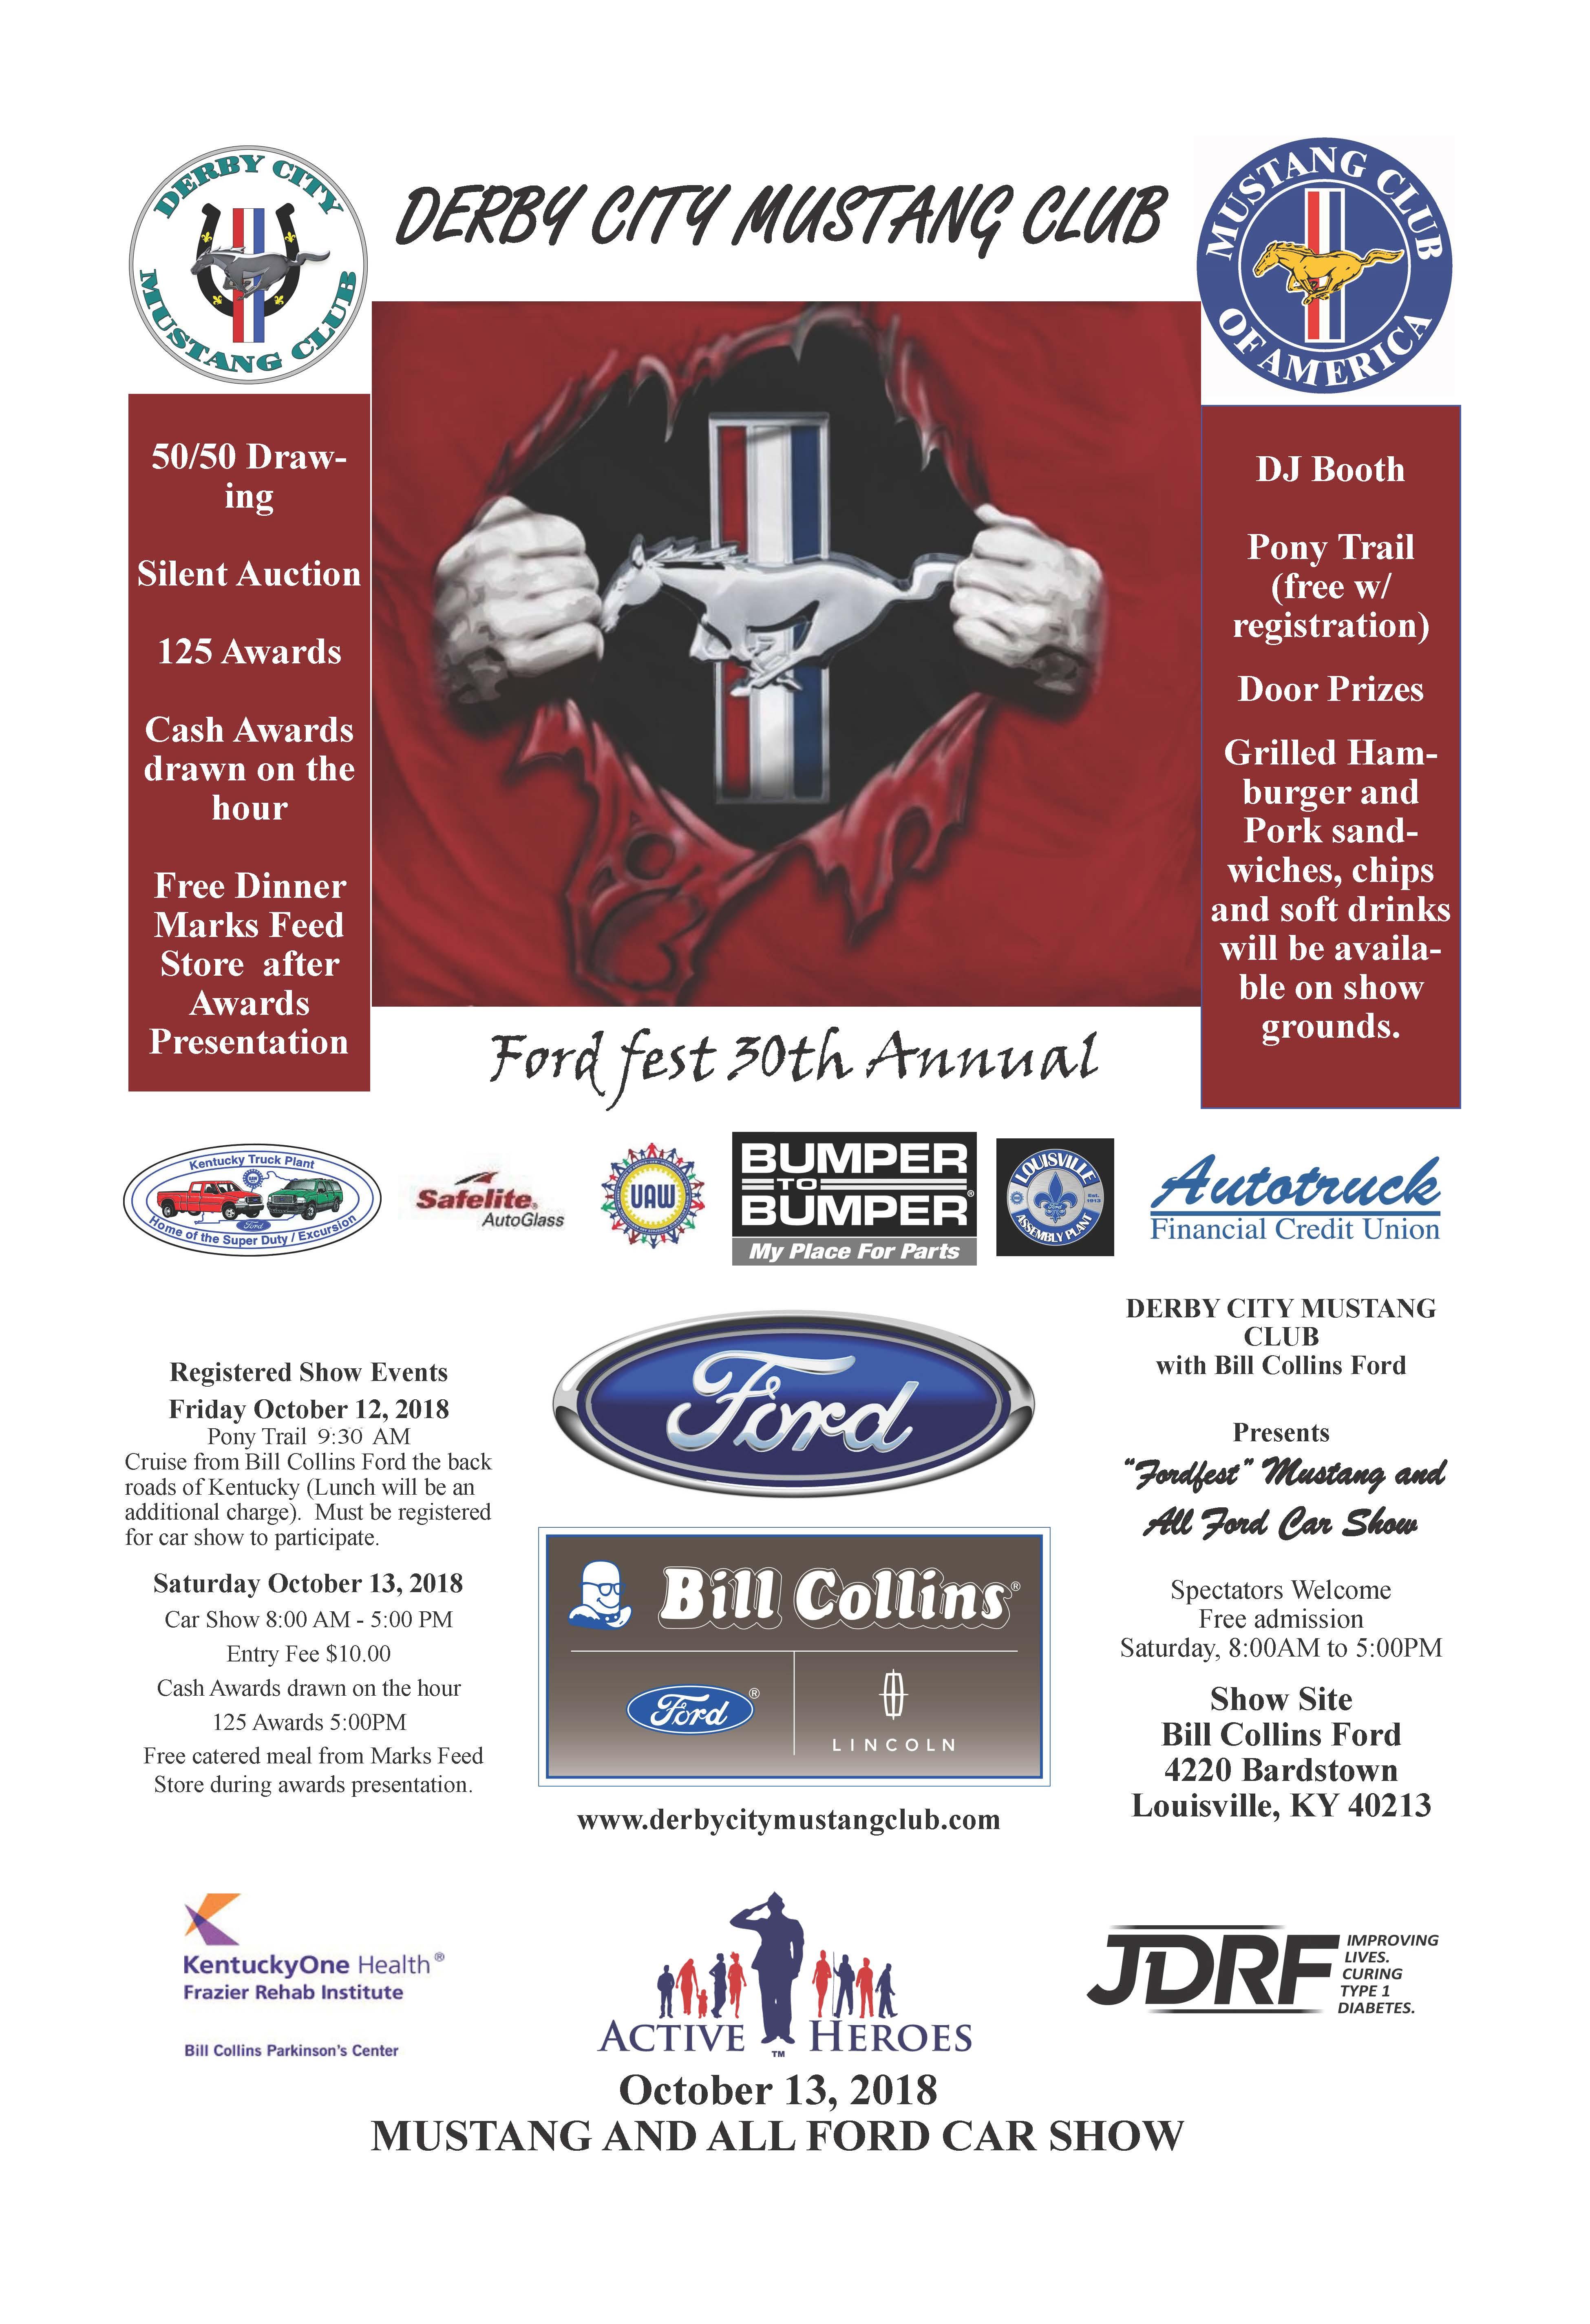 FordFest Derby City Mustang Club - Bill collins ford car show